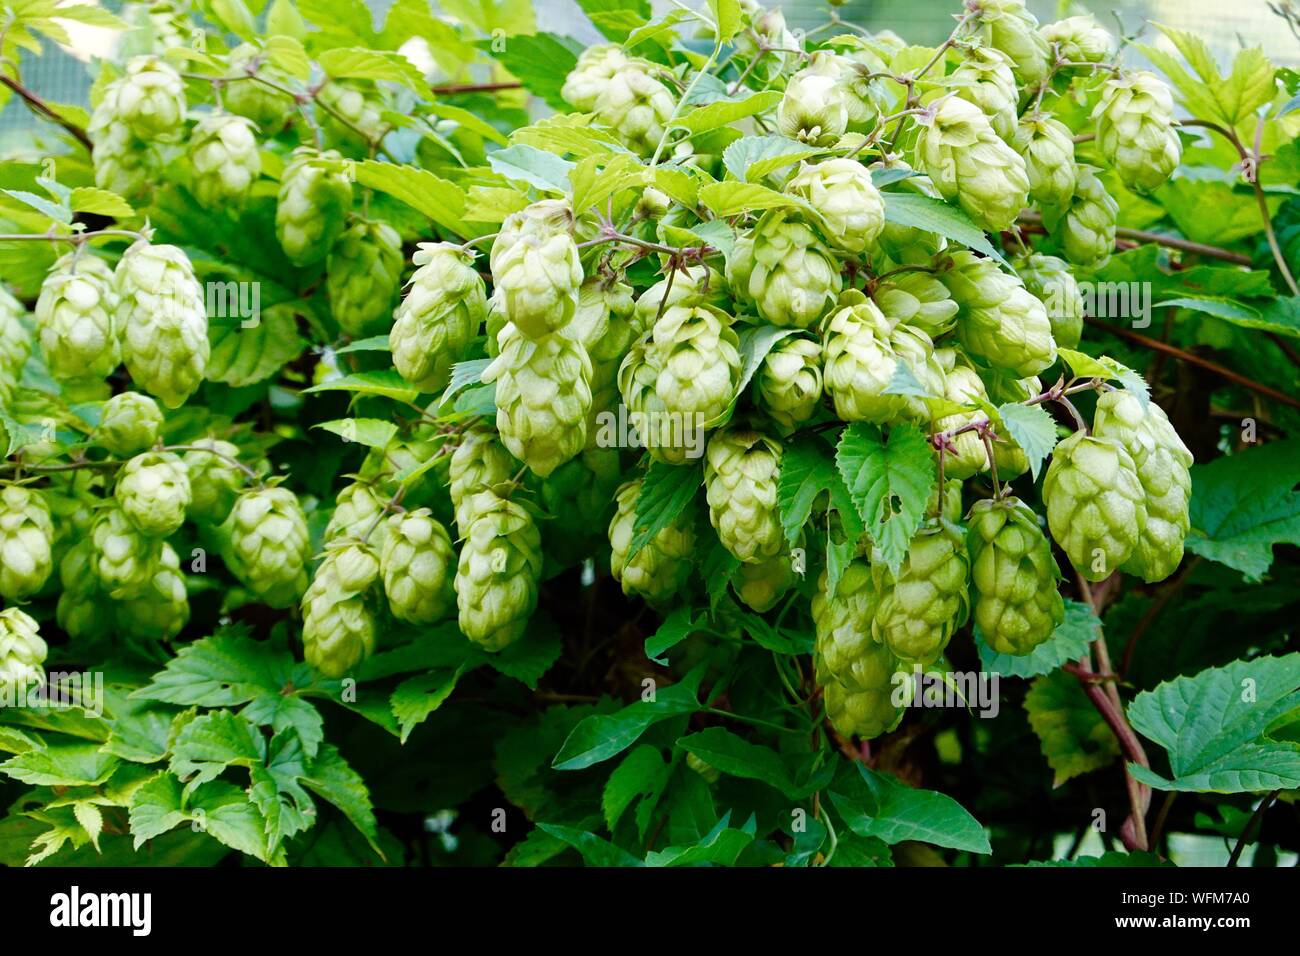 humulus-lupulus-hops-growing-in-the-kitc